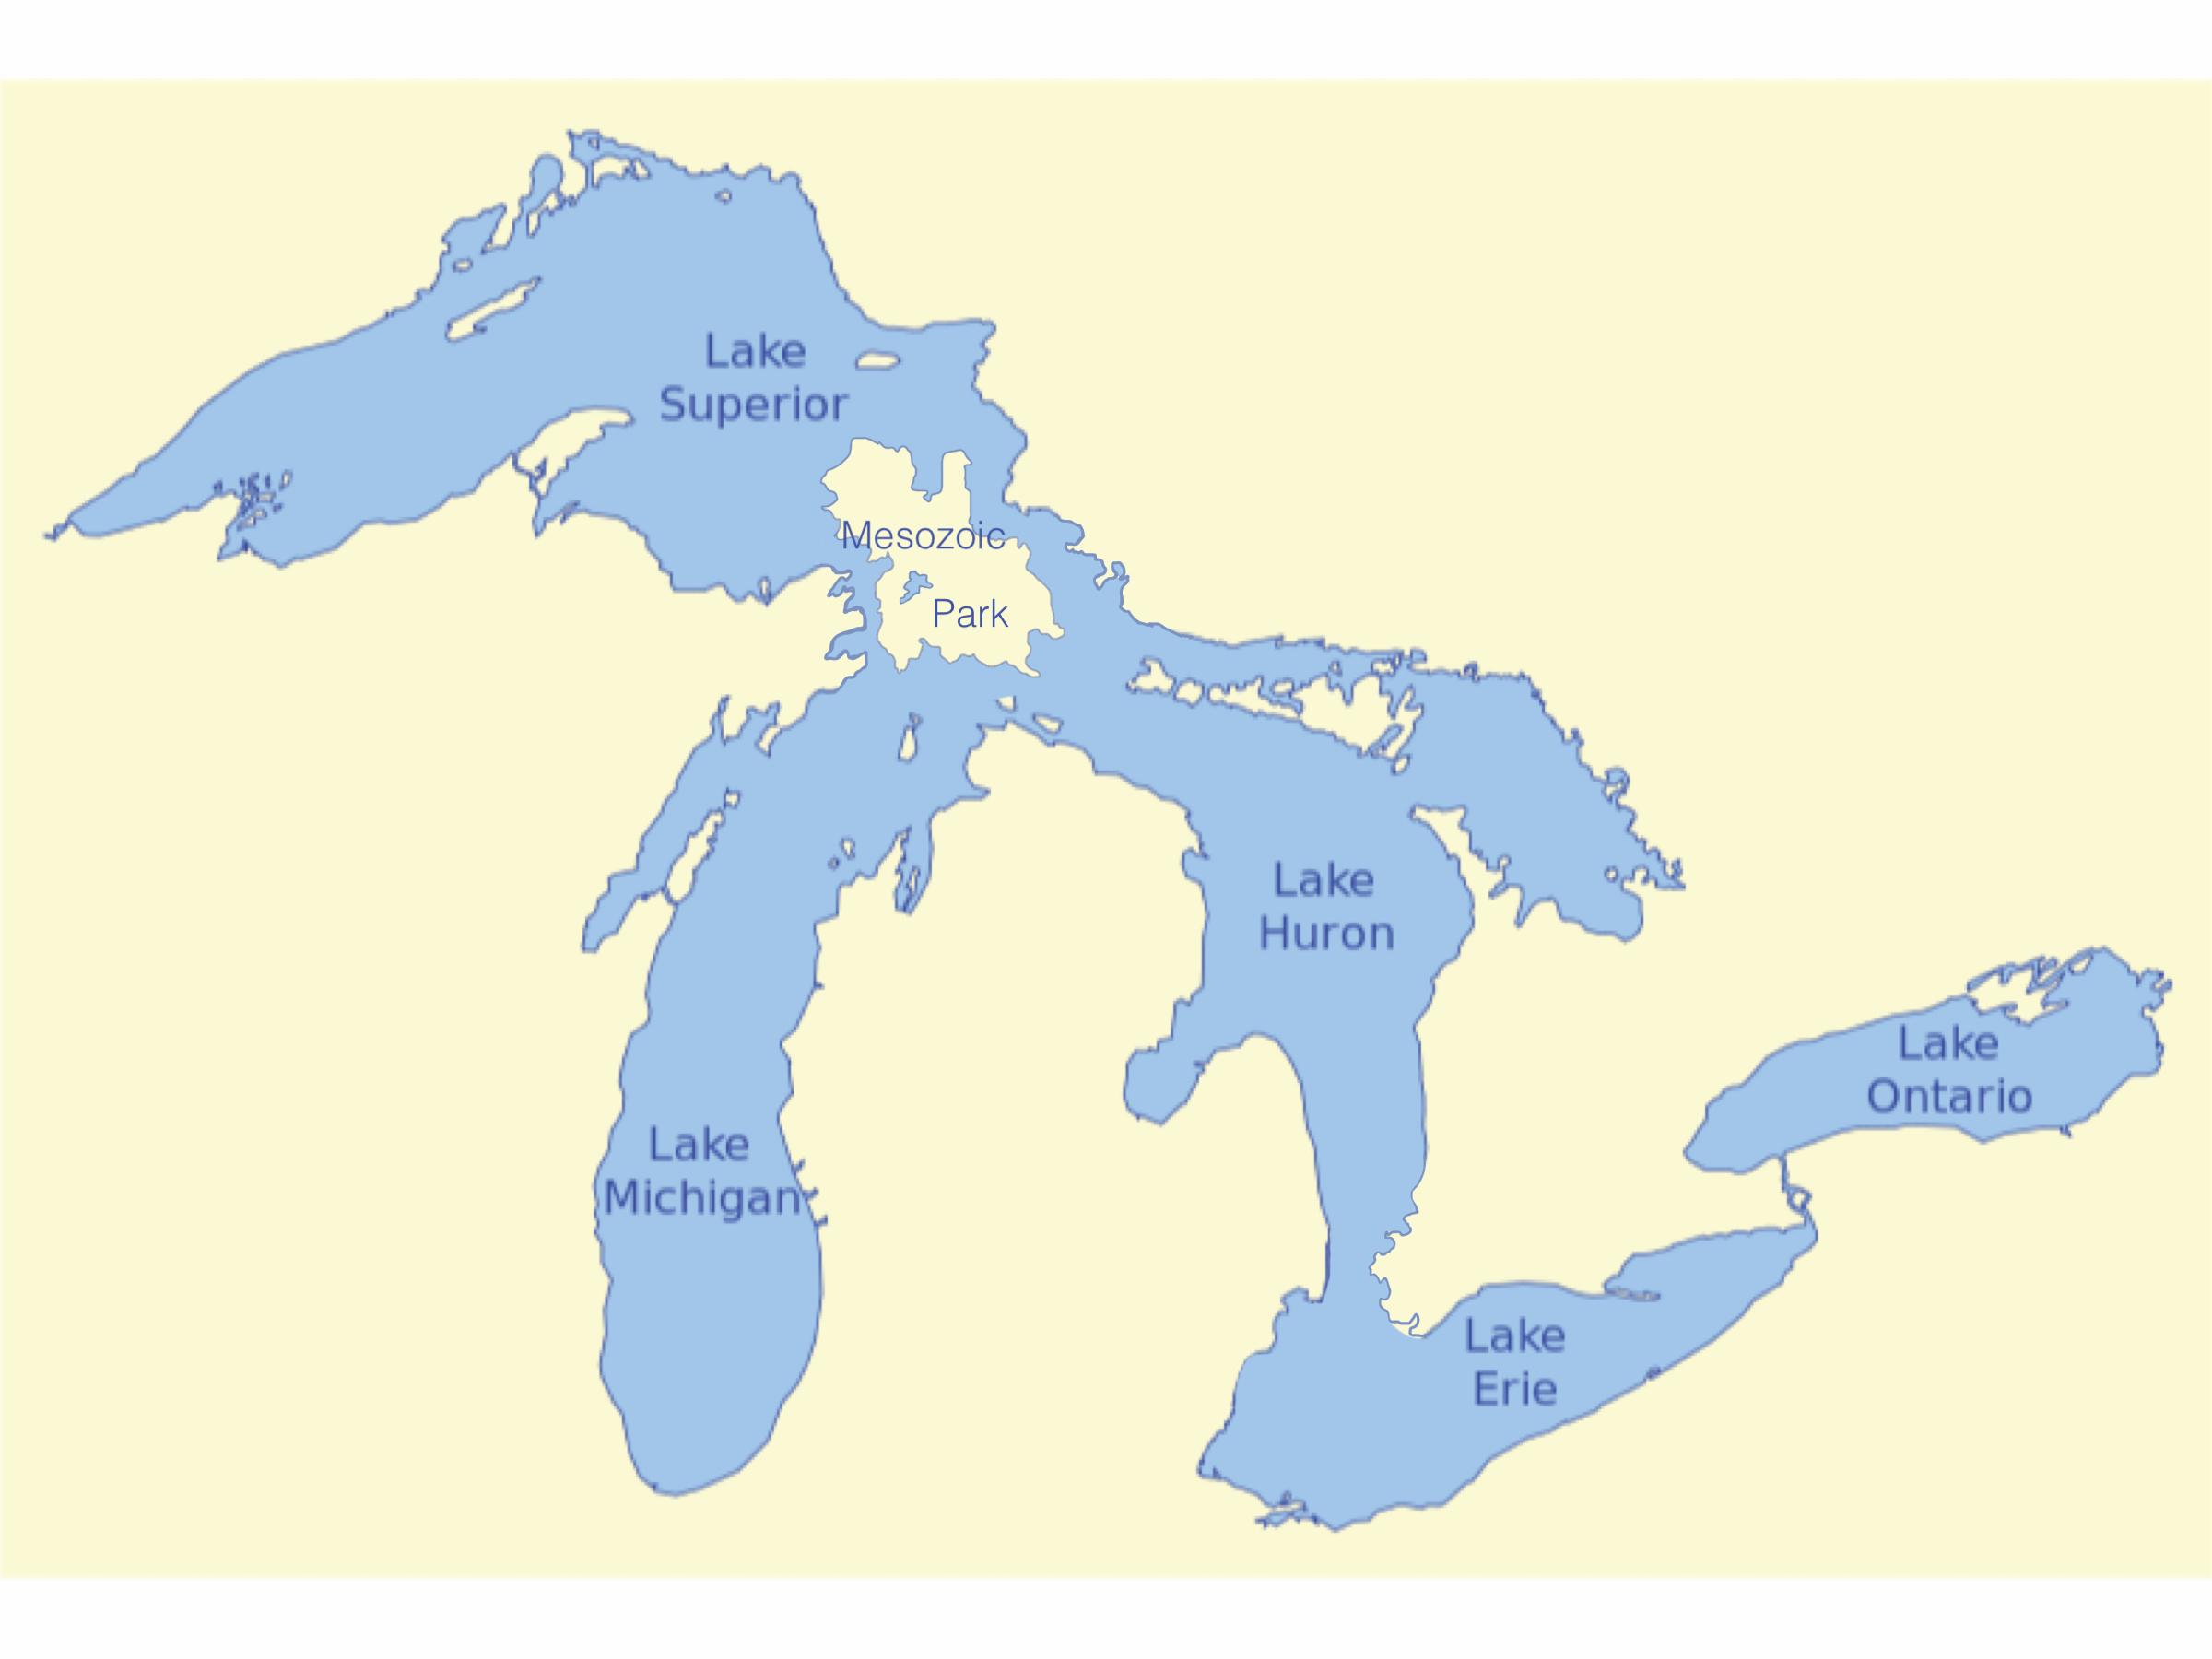 Где находится озеро верхние на карте